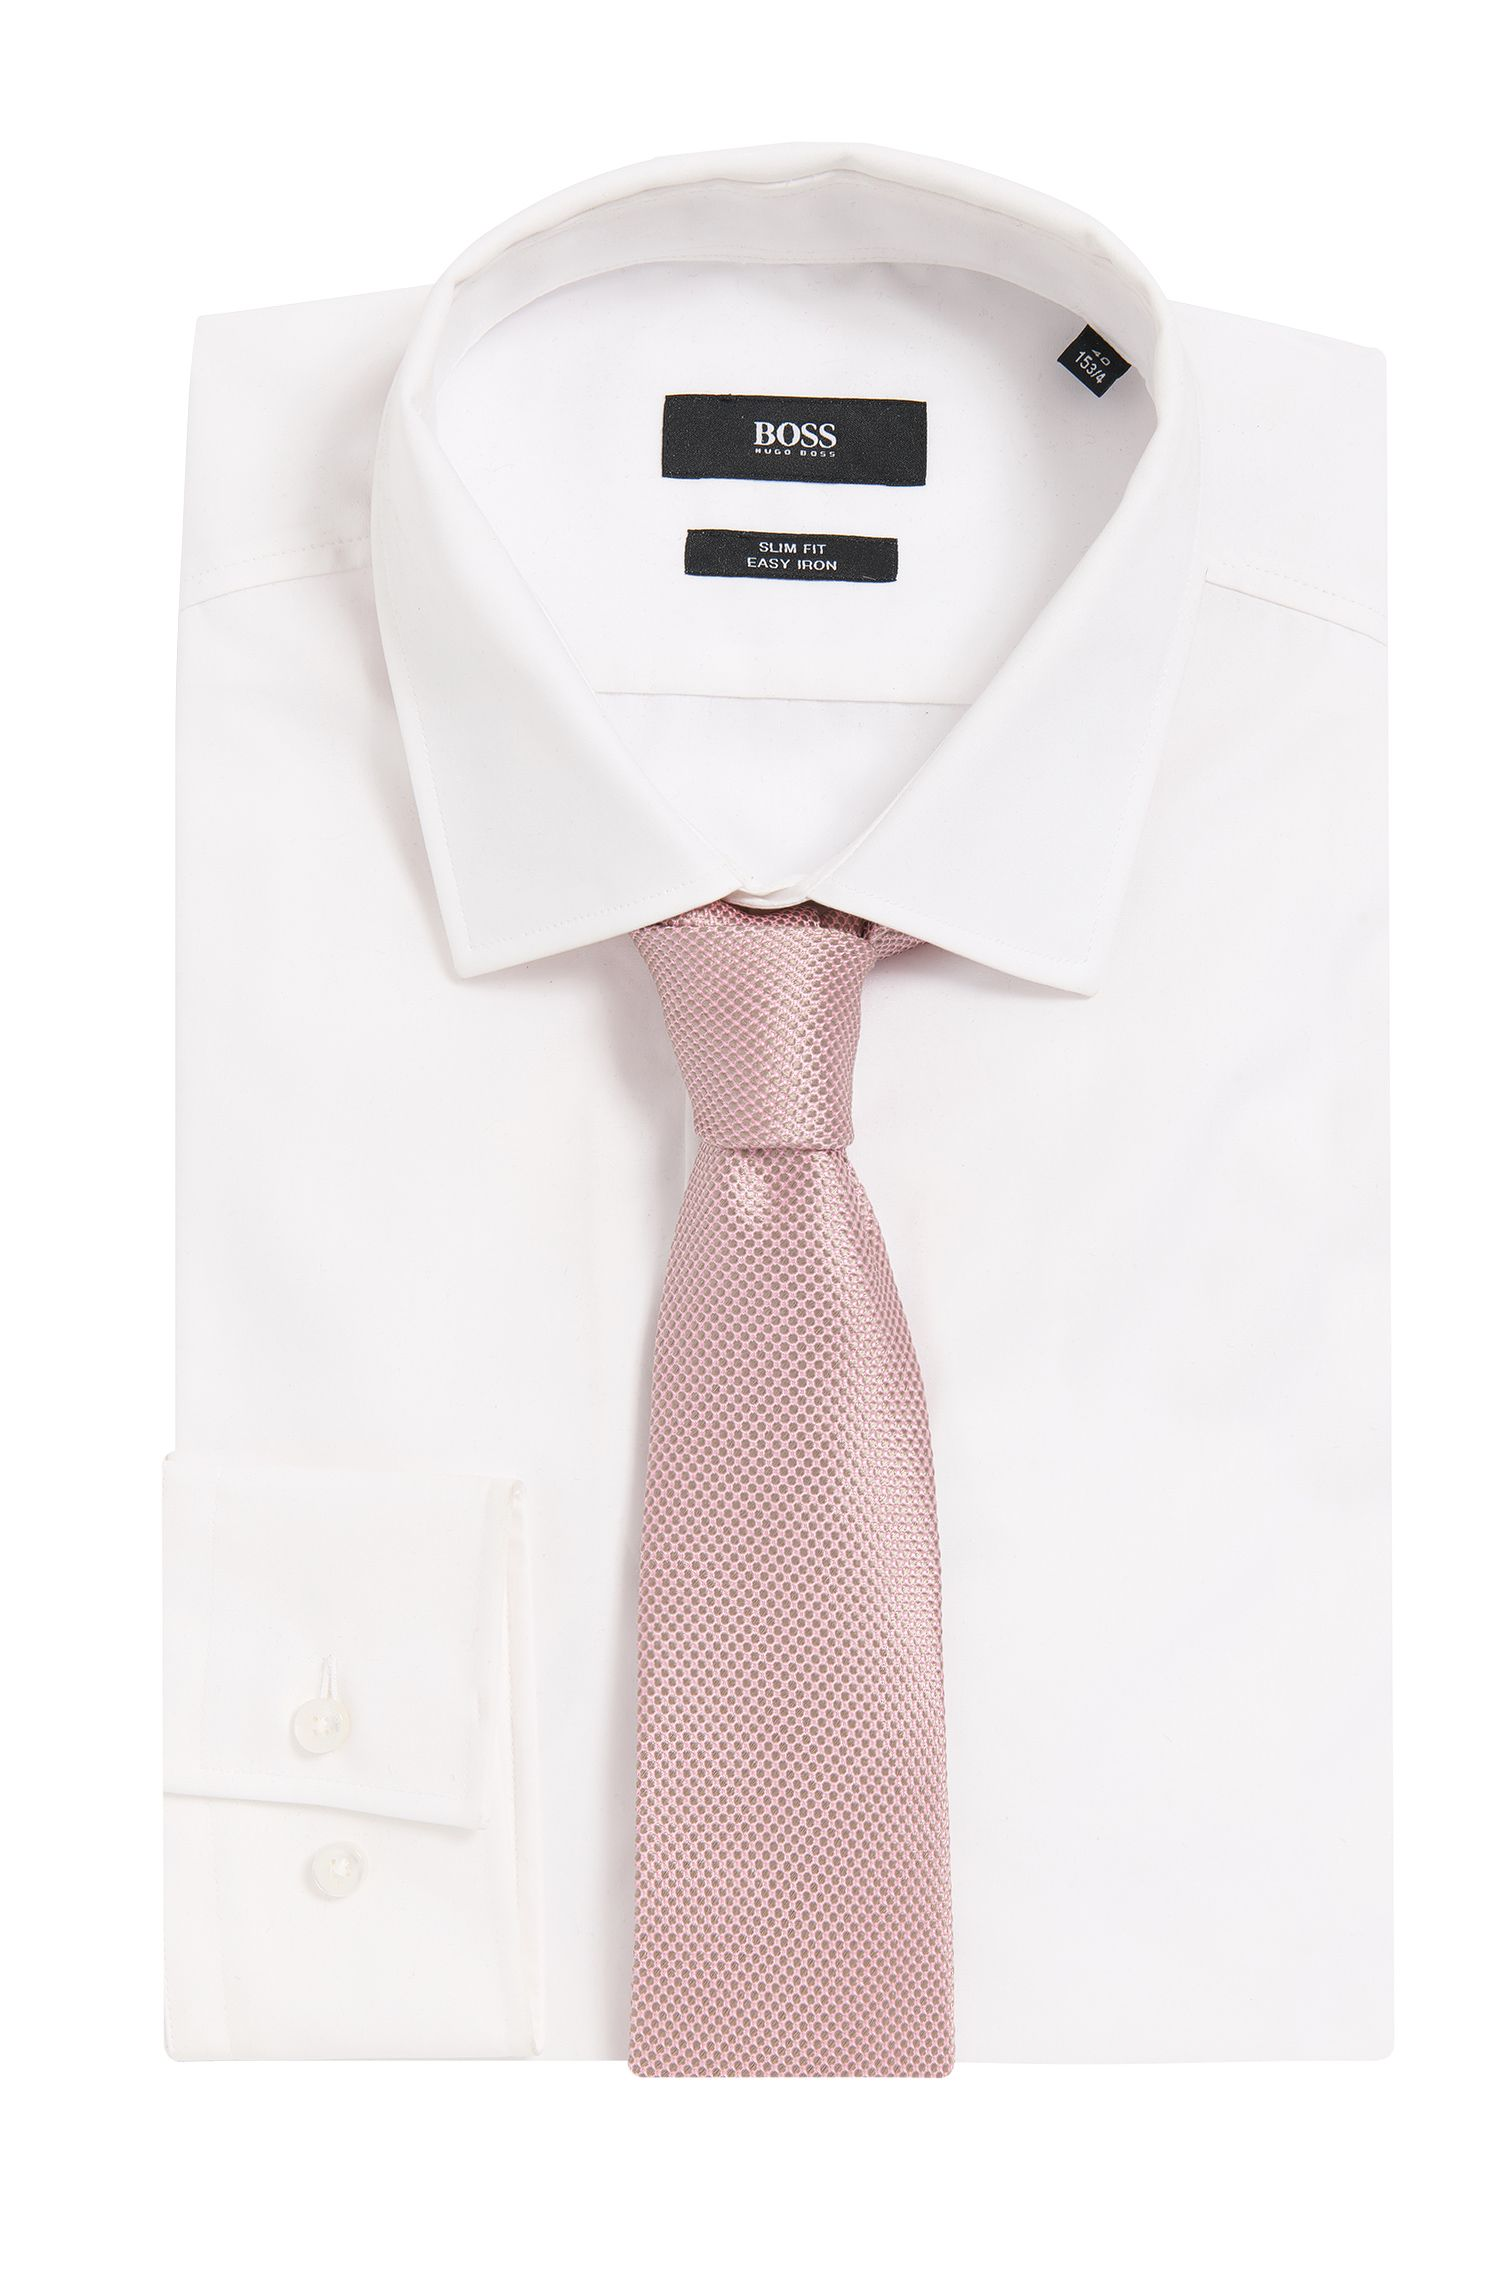 BOSS Tailored Birdseye Italian Silk Tie